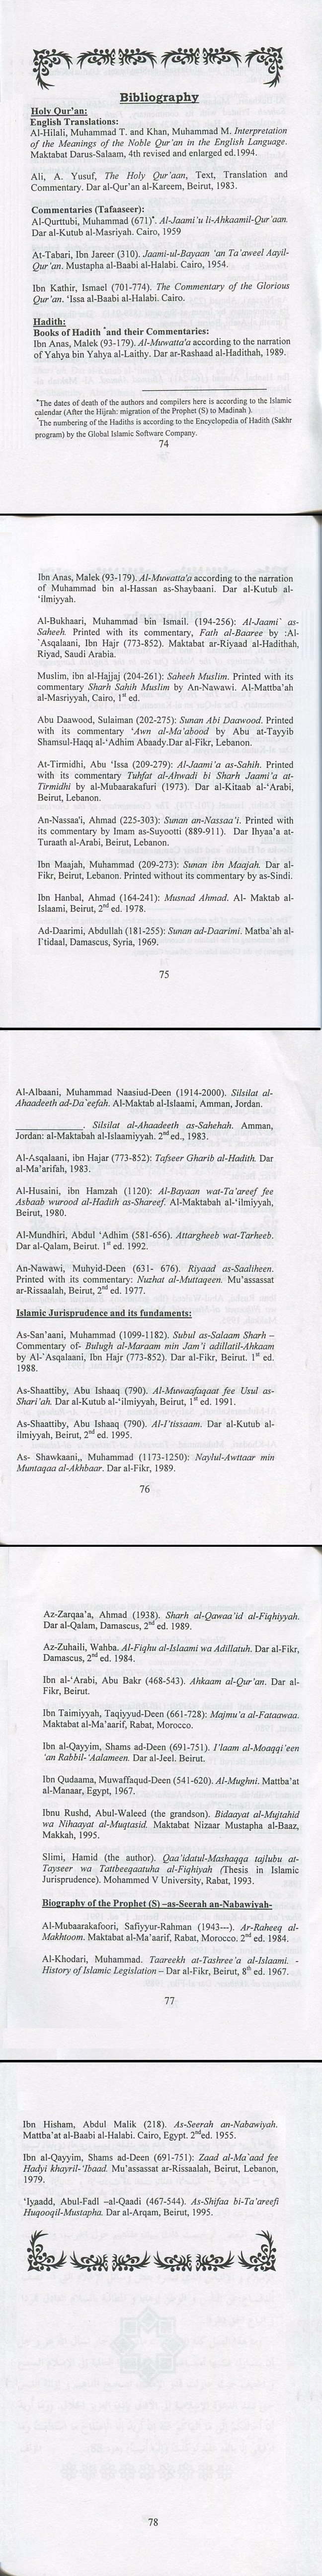 SLIMI Terrorism Bibliography